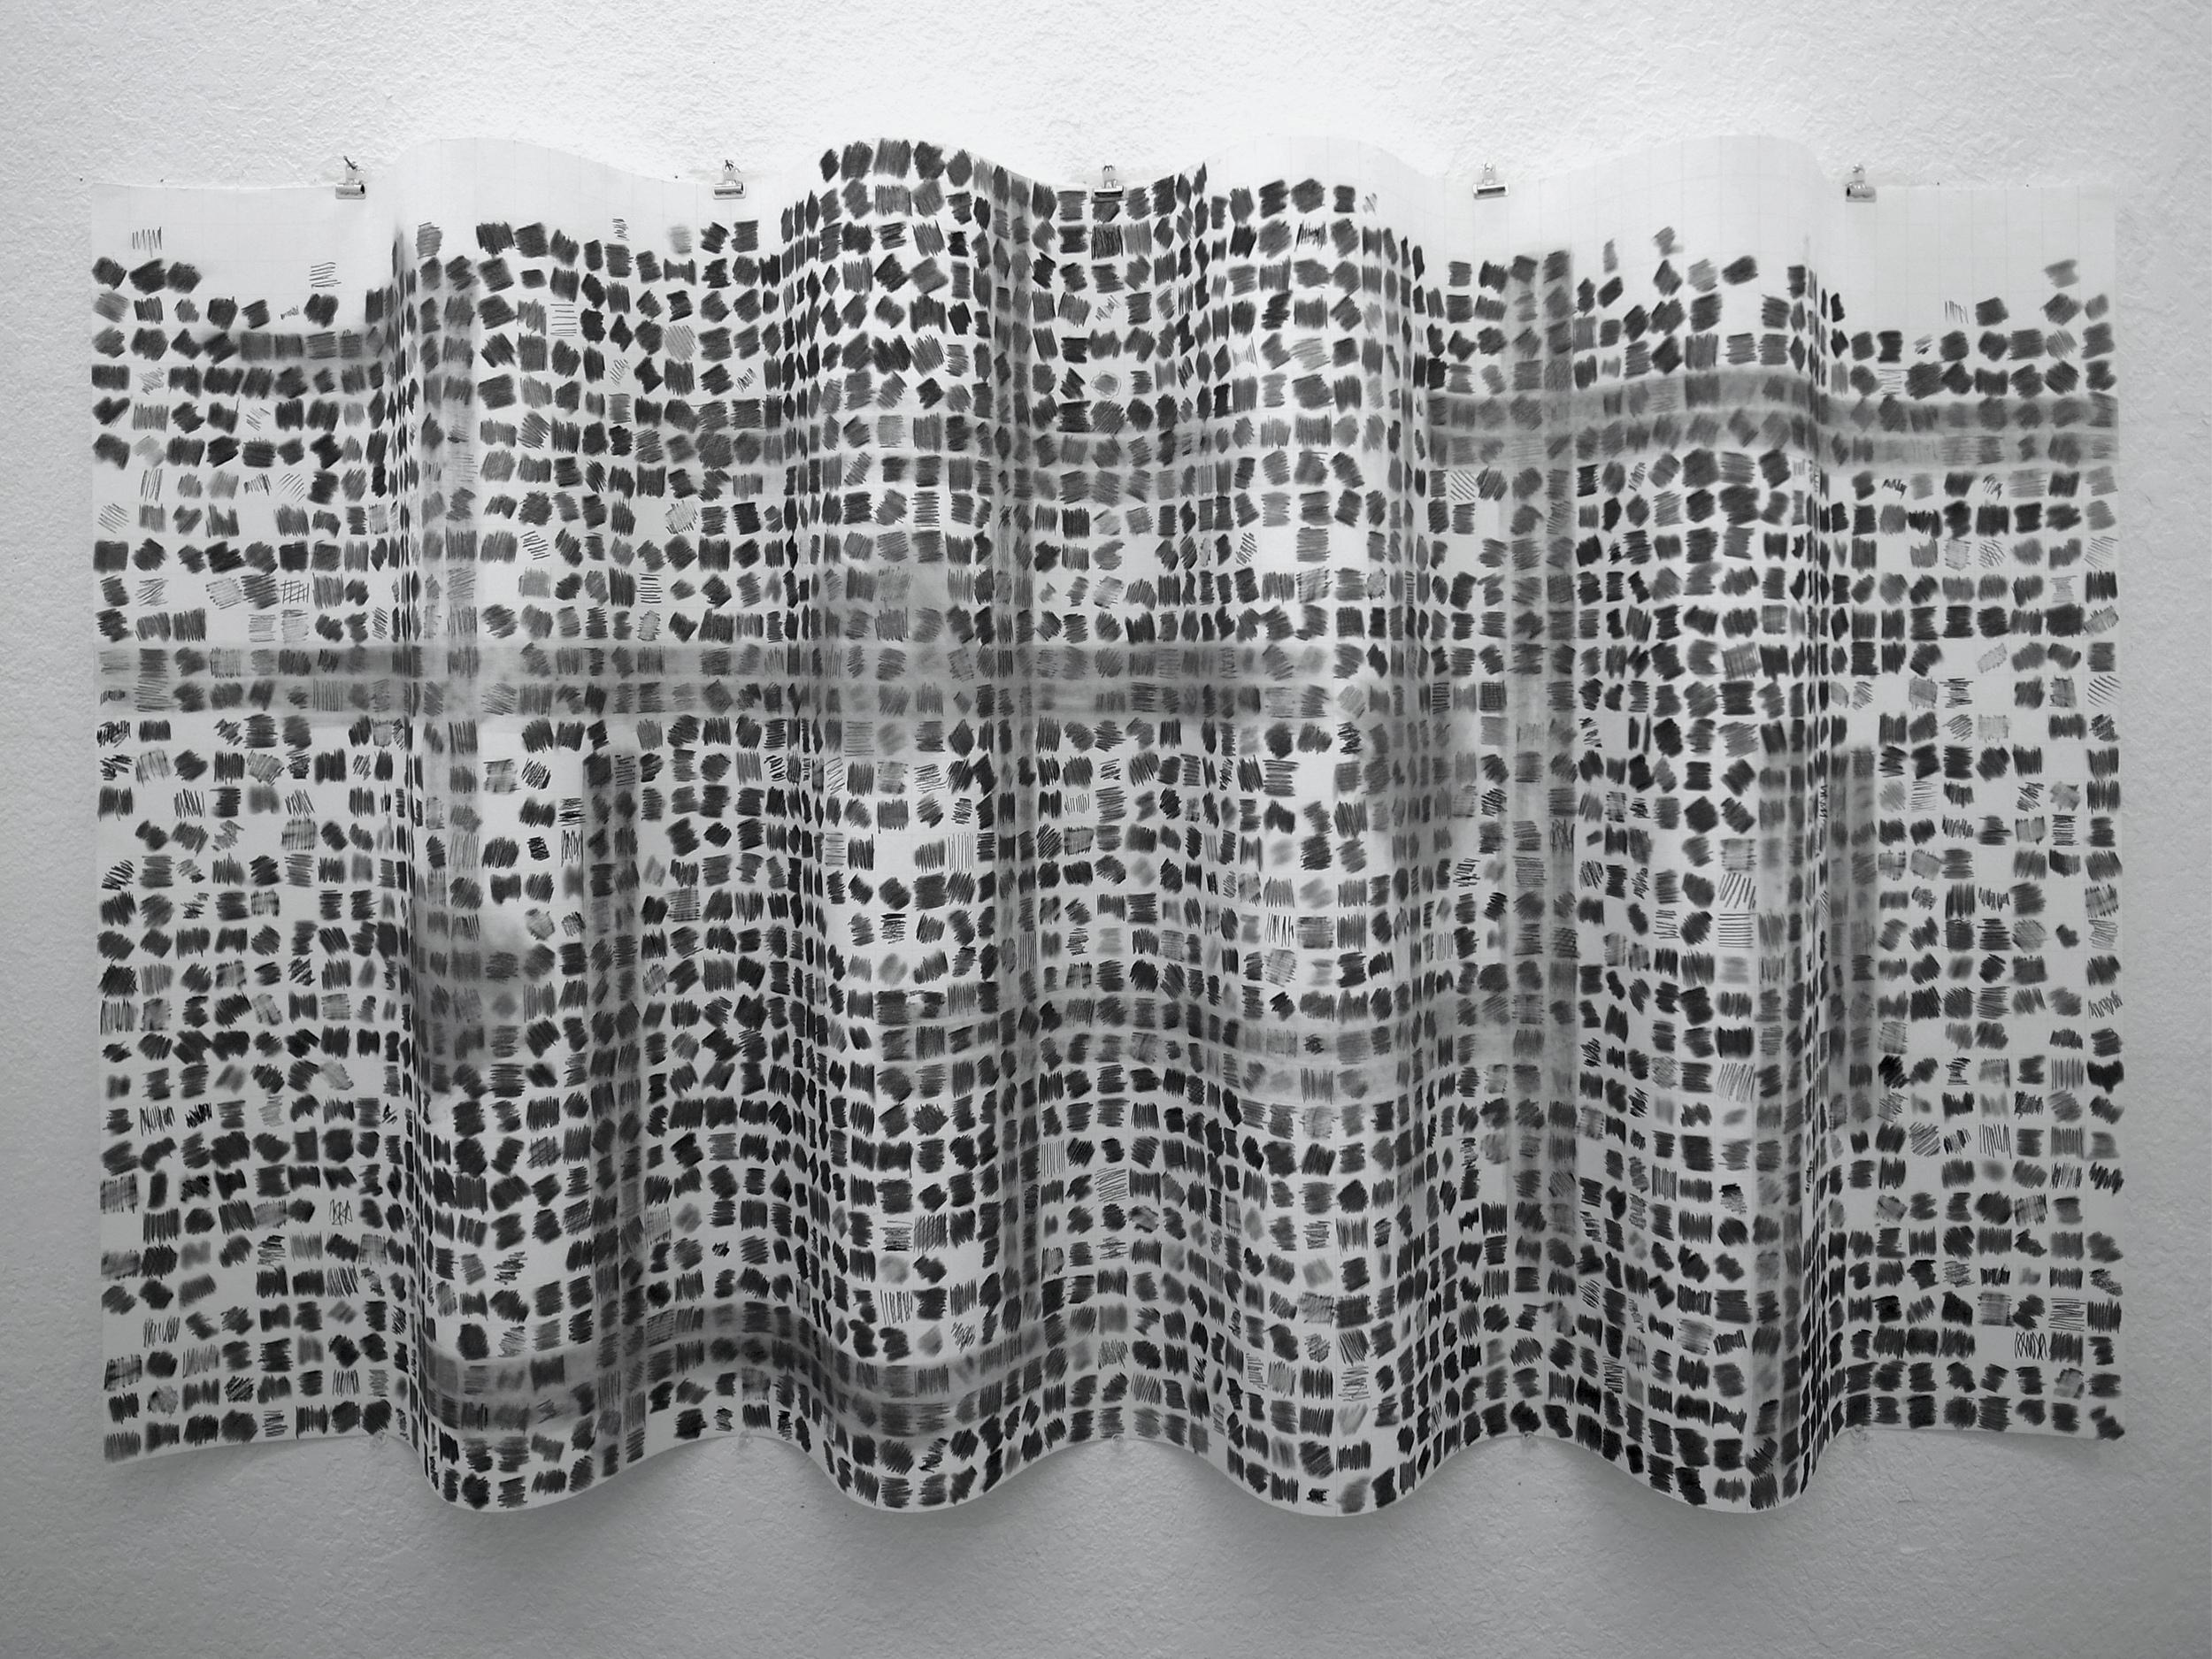 landscape of pixel no. 8